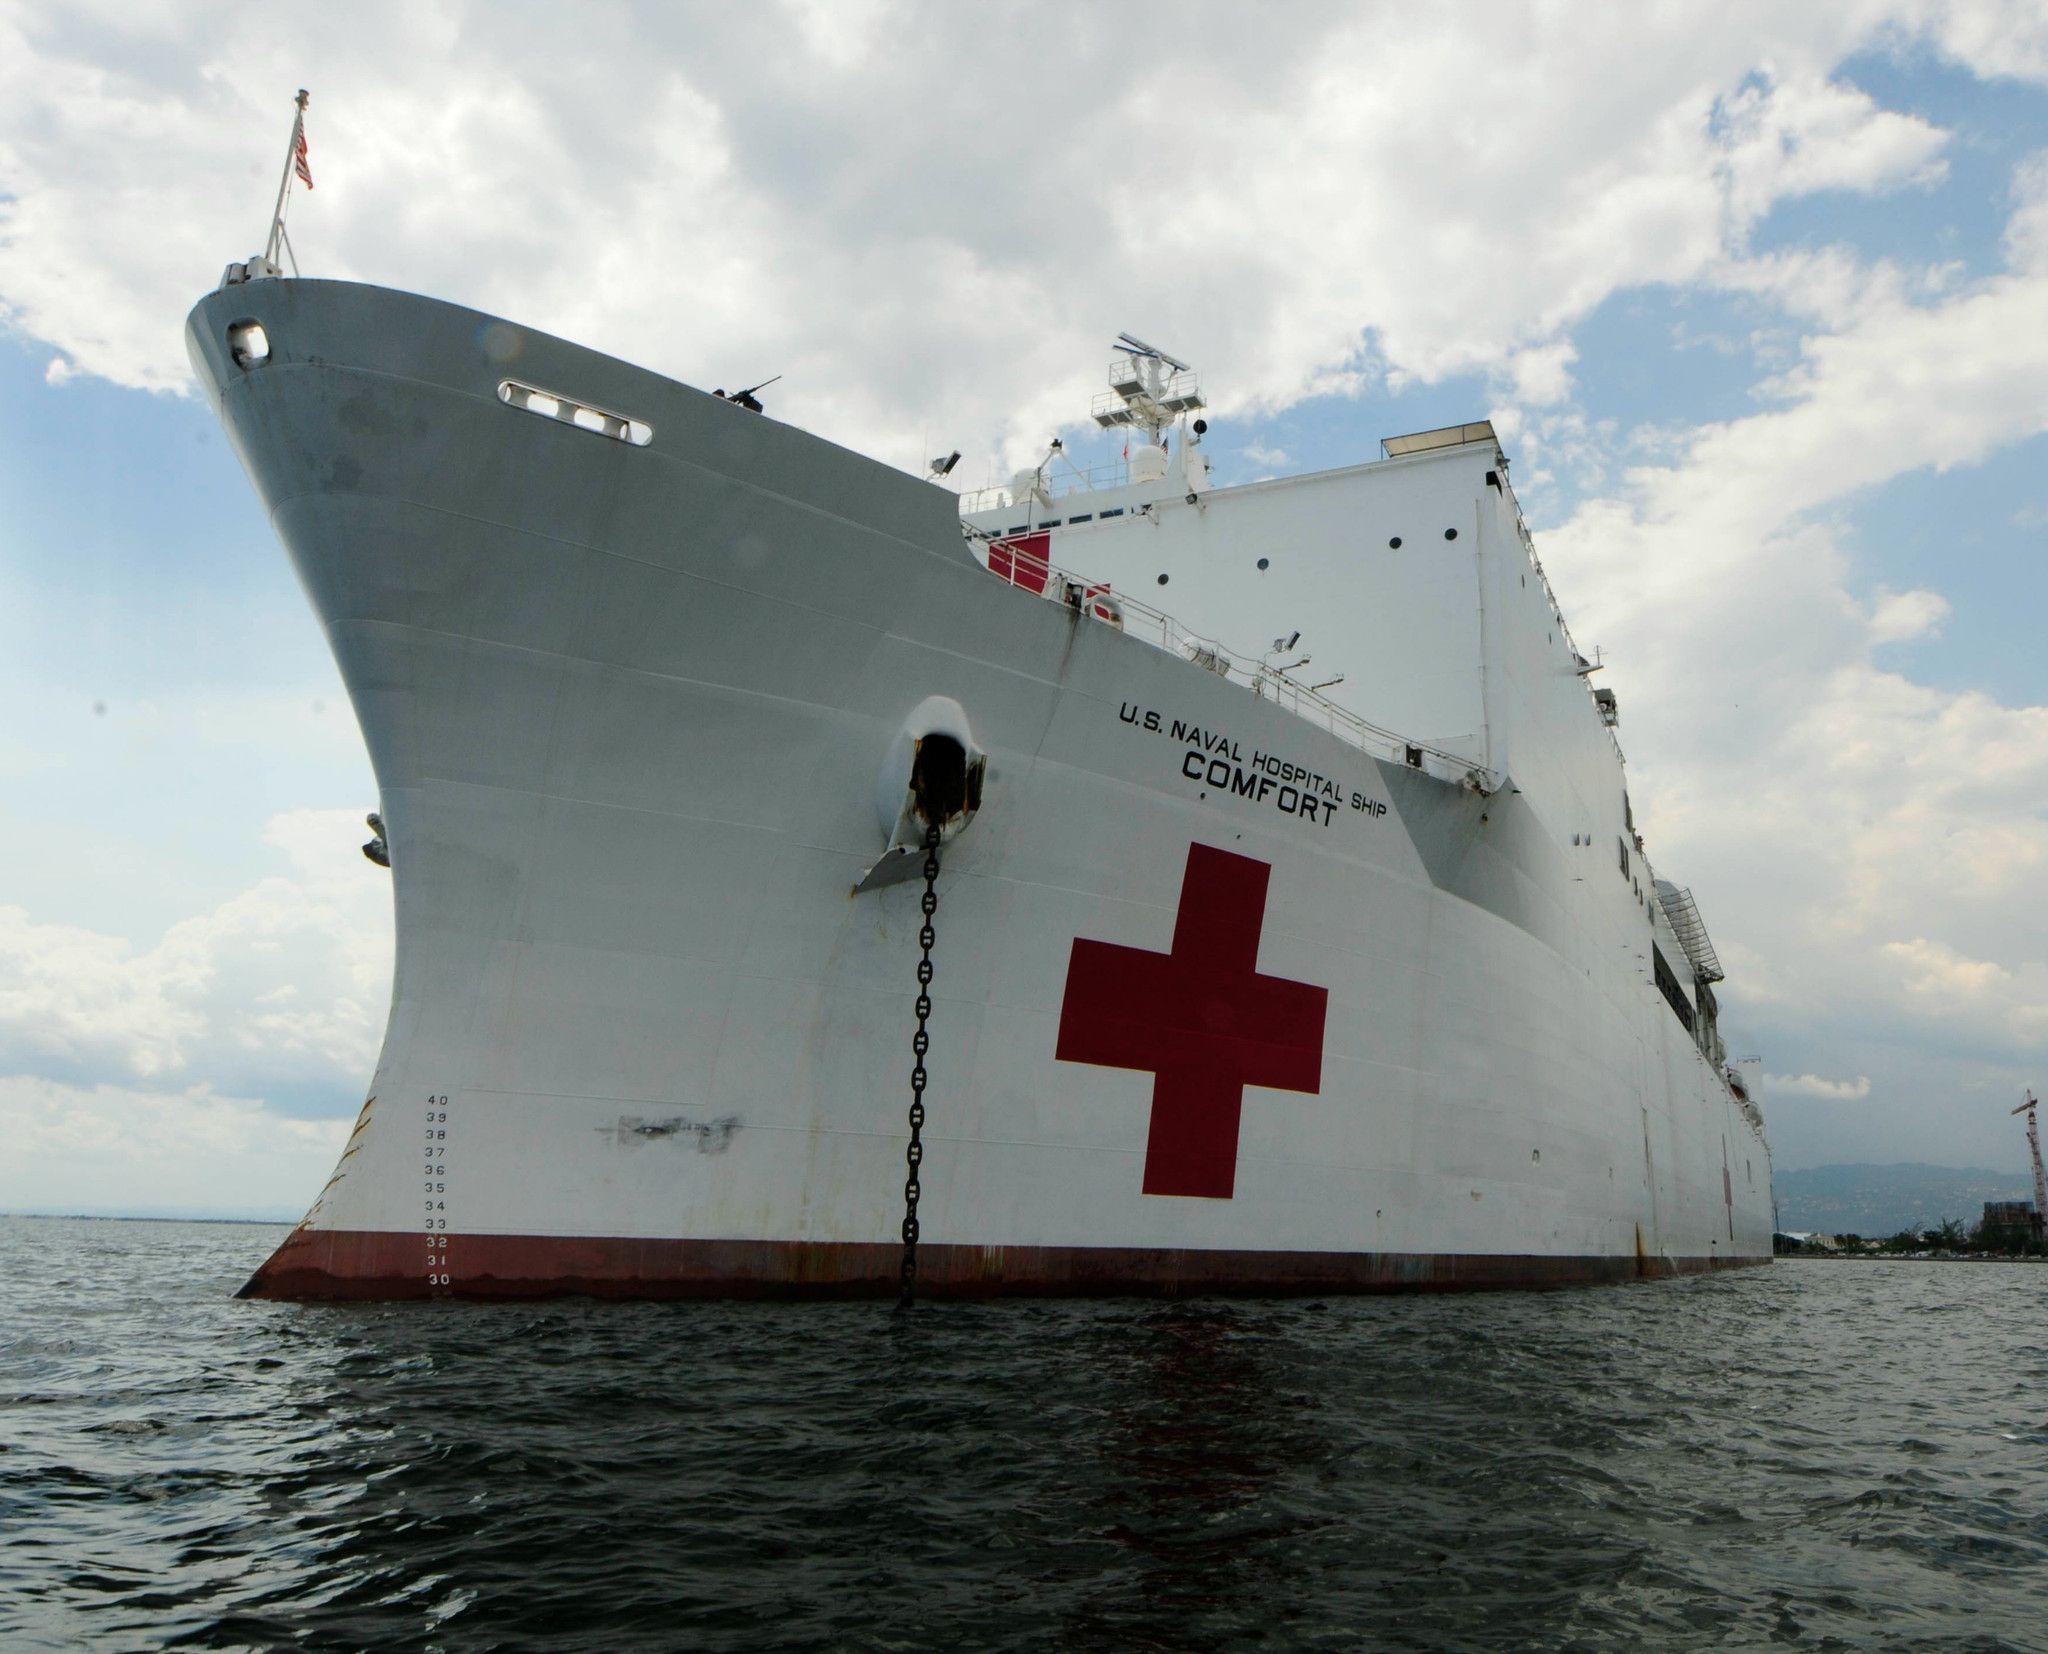 Military Sealift Command Hospital Ship Usns Comfort T Ah 20 Kingston Jamaica April 13 2011 8 X 10 Photograph Fine Art Photo Prints Hospital Photographic Print